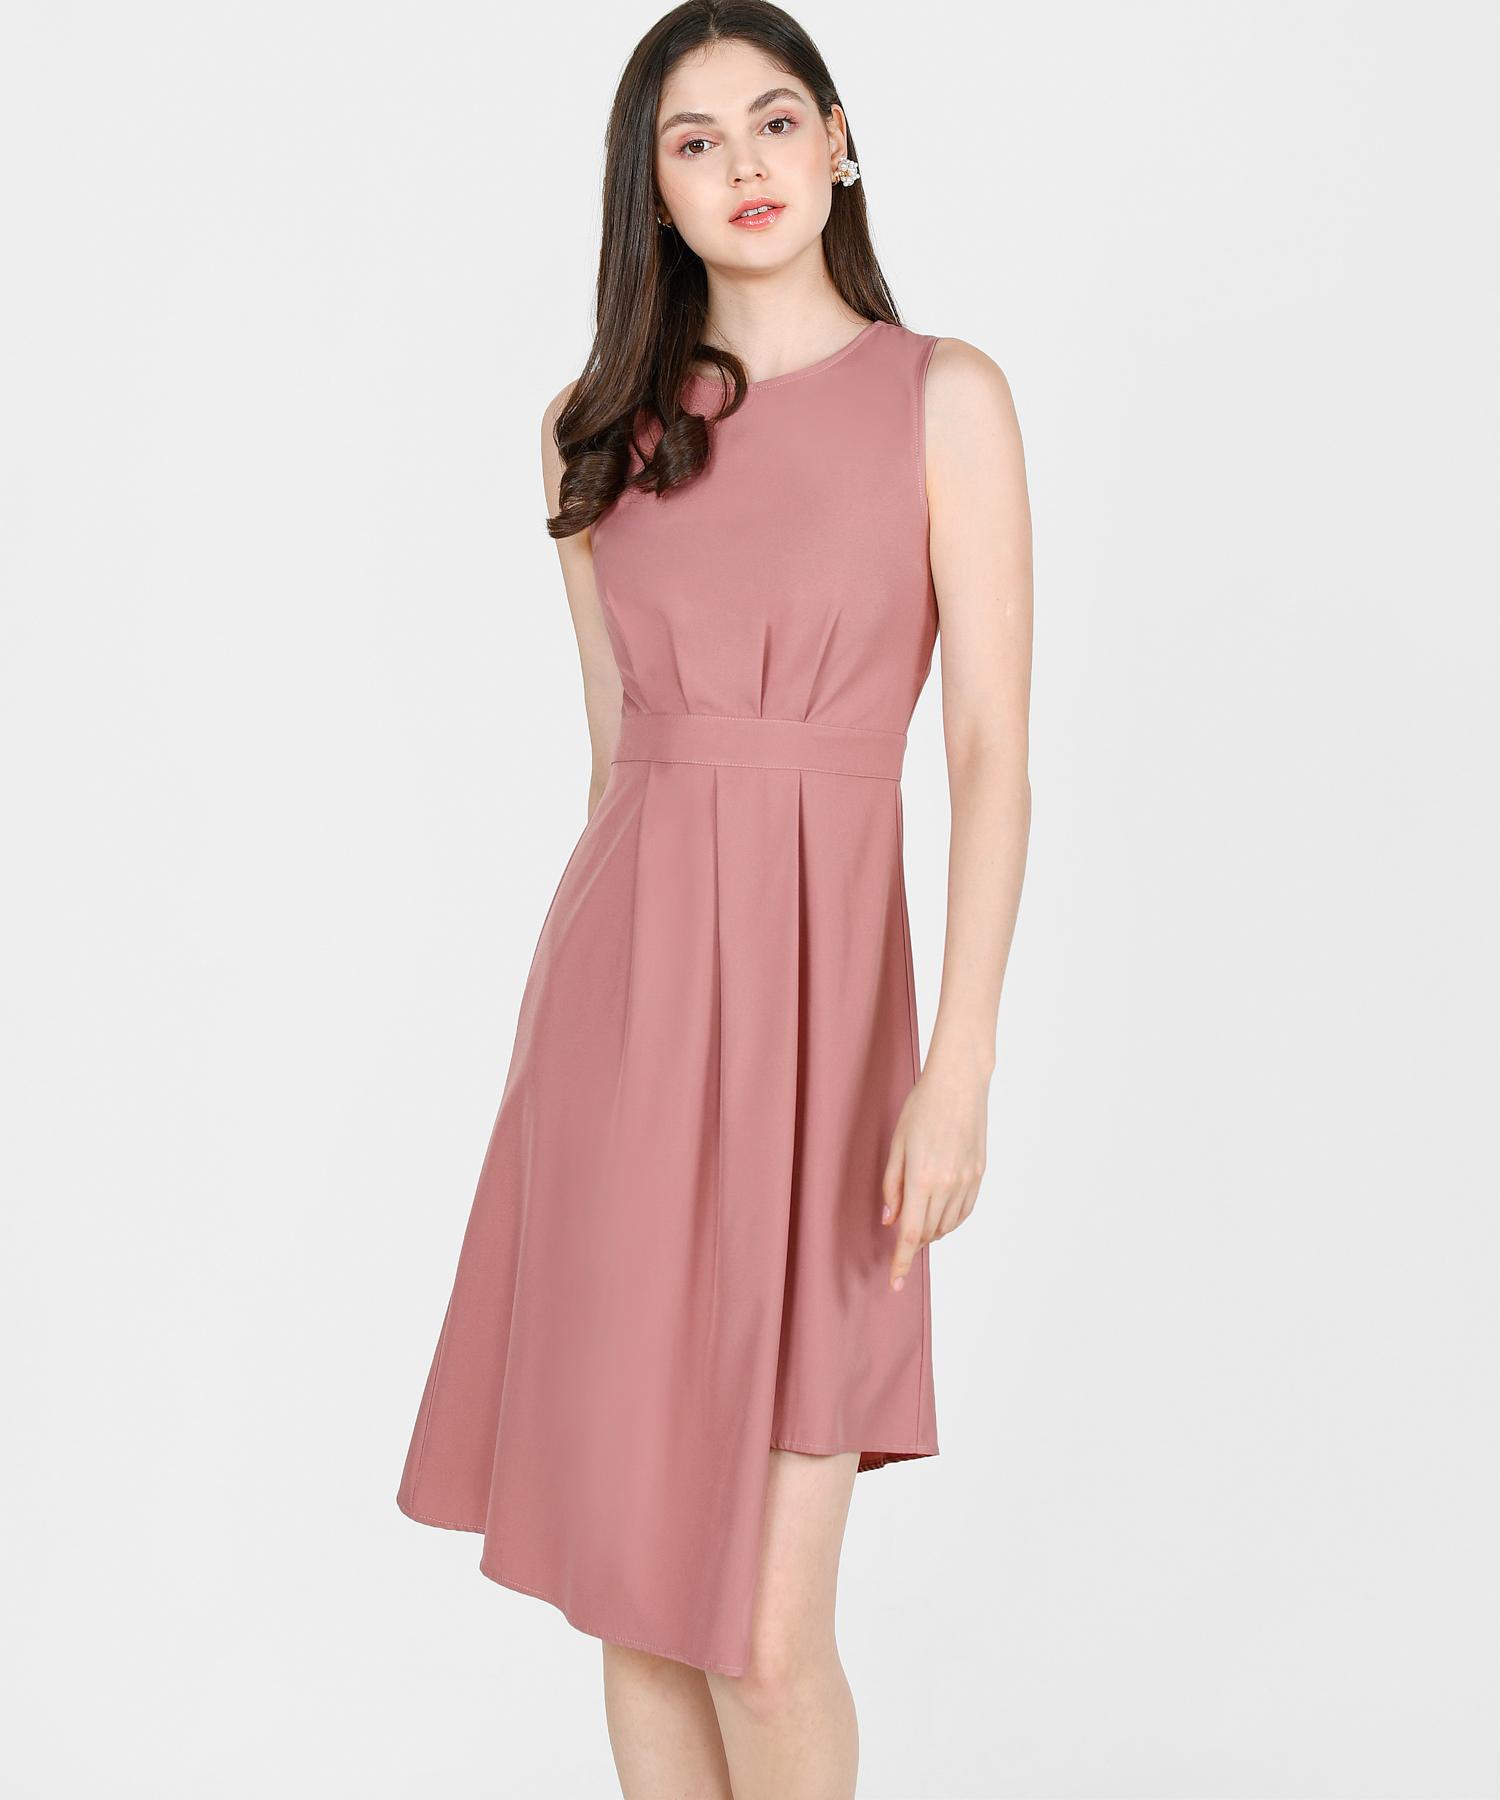 saloni-asymmetrical-midi-dress-dust-rose-1